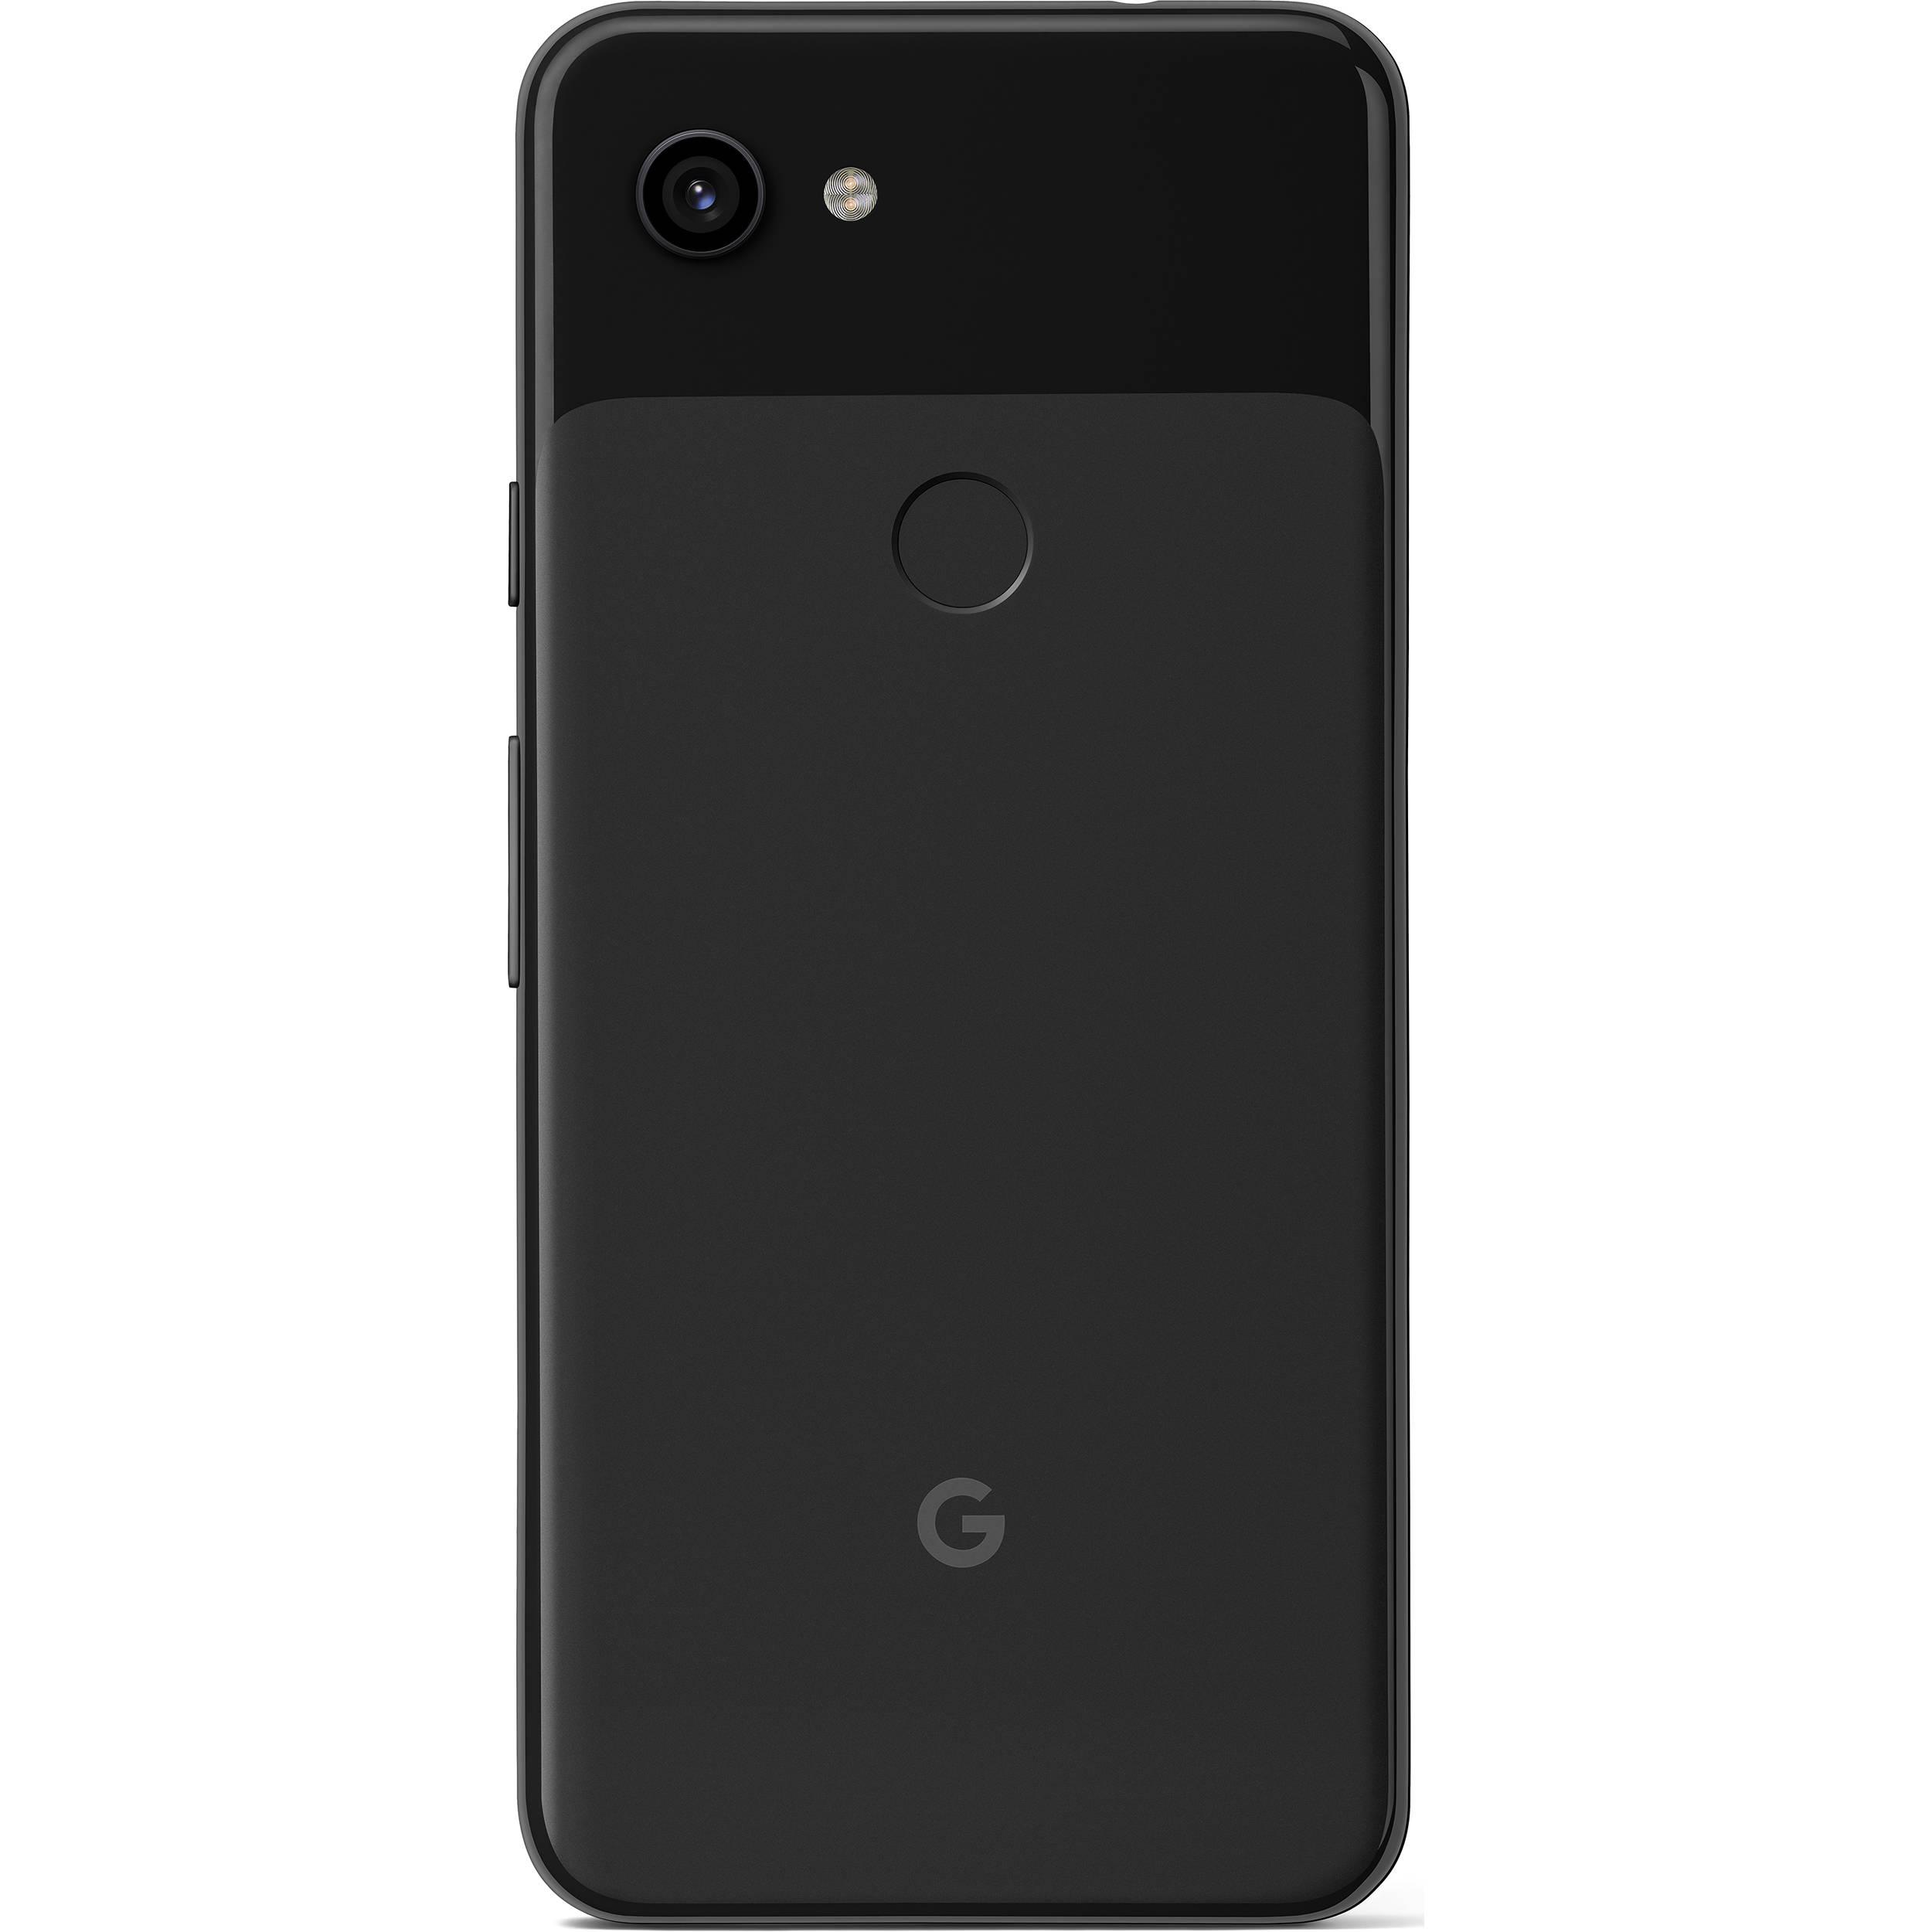 Google Pixel 3a Smartphone (Unlocked, Just Black)